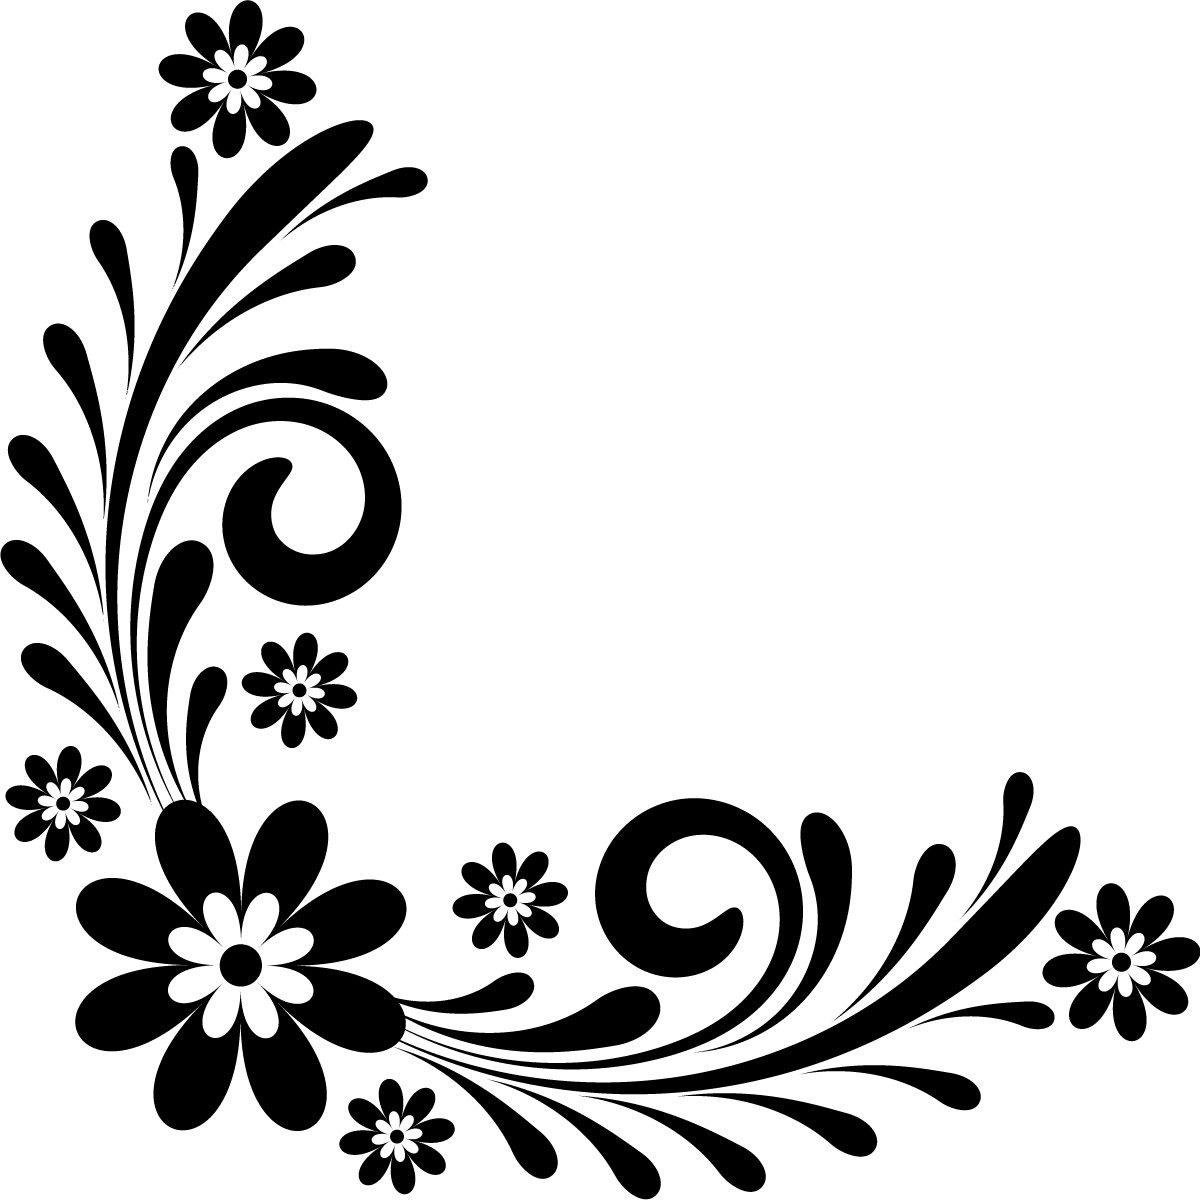 1200x1200 Black And White Corner Design